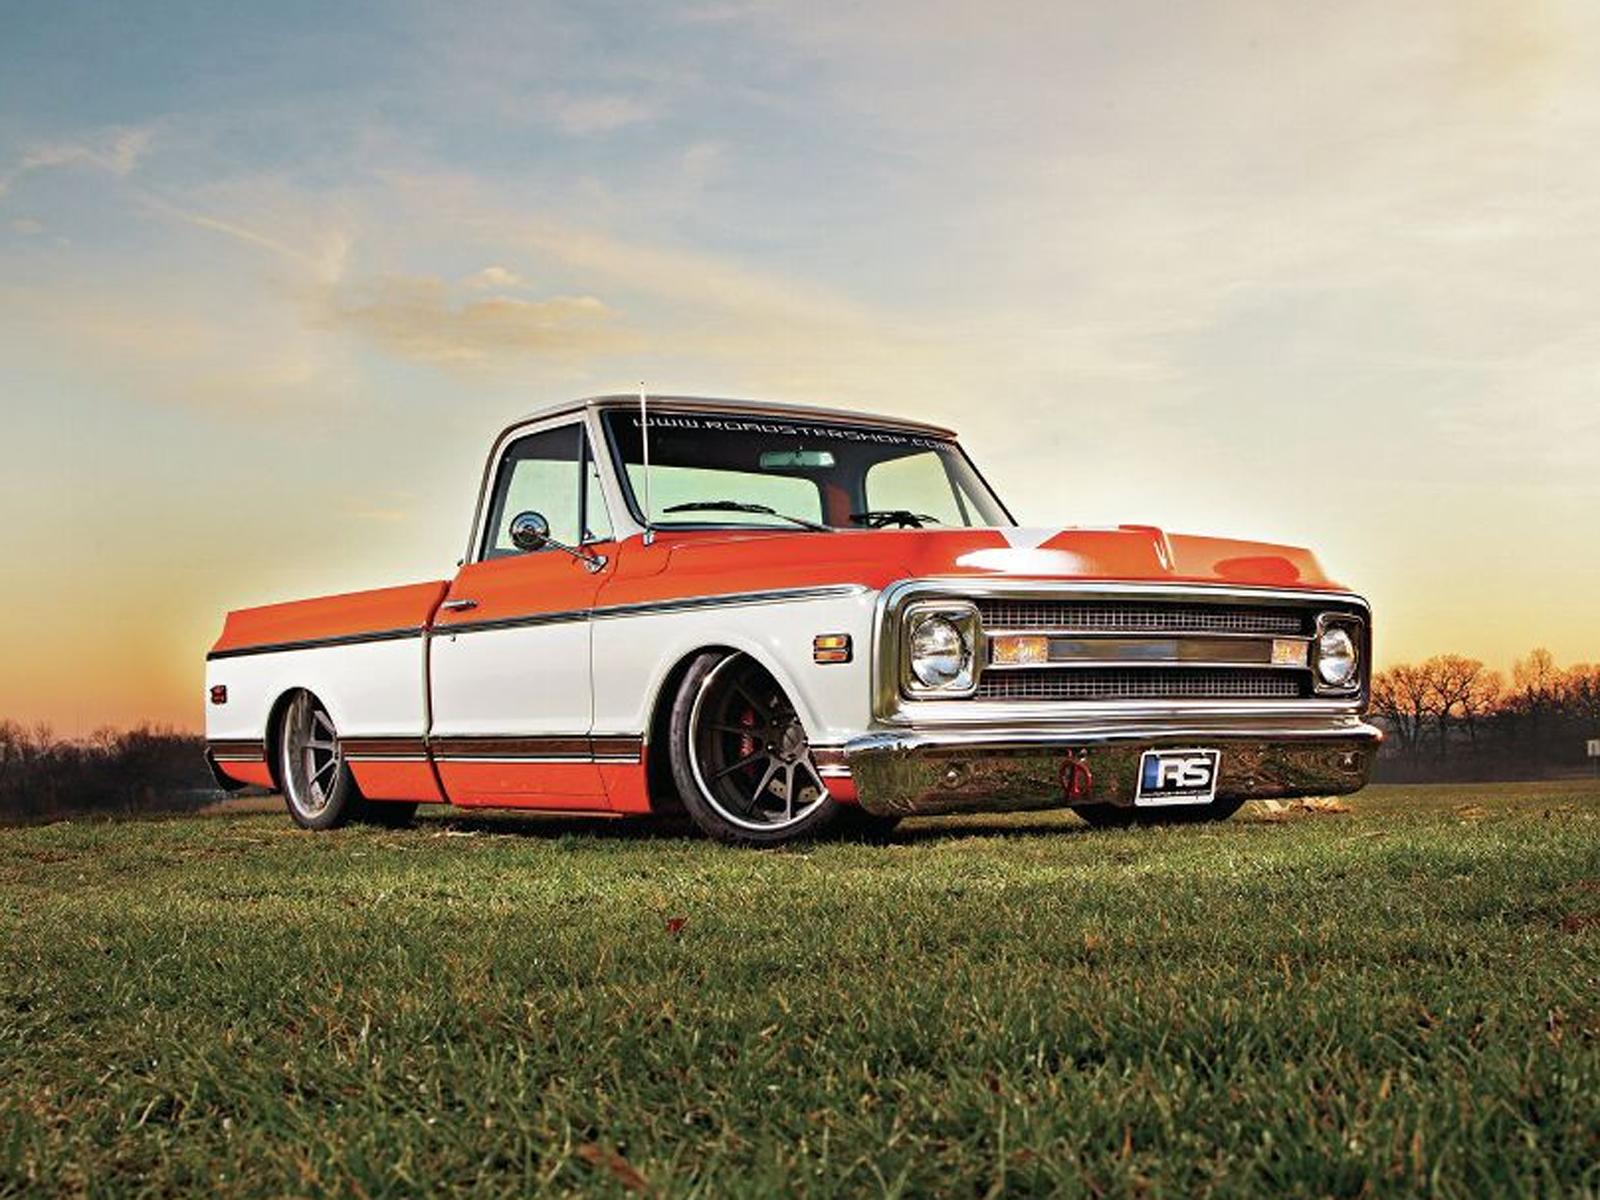 Classic Chevy Truck Wallpaper Old Chevy Truck 1600x1200 Download Hd Wallpaper Wallpapertip